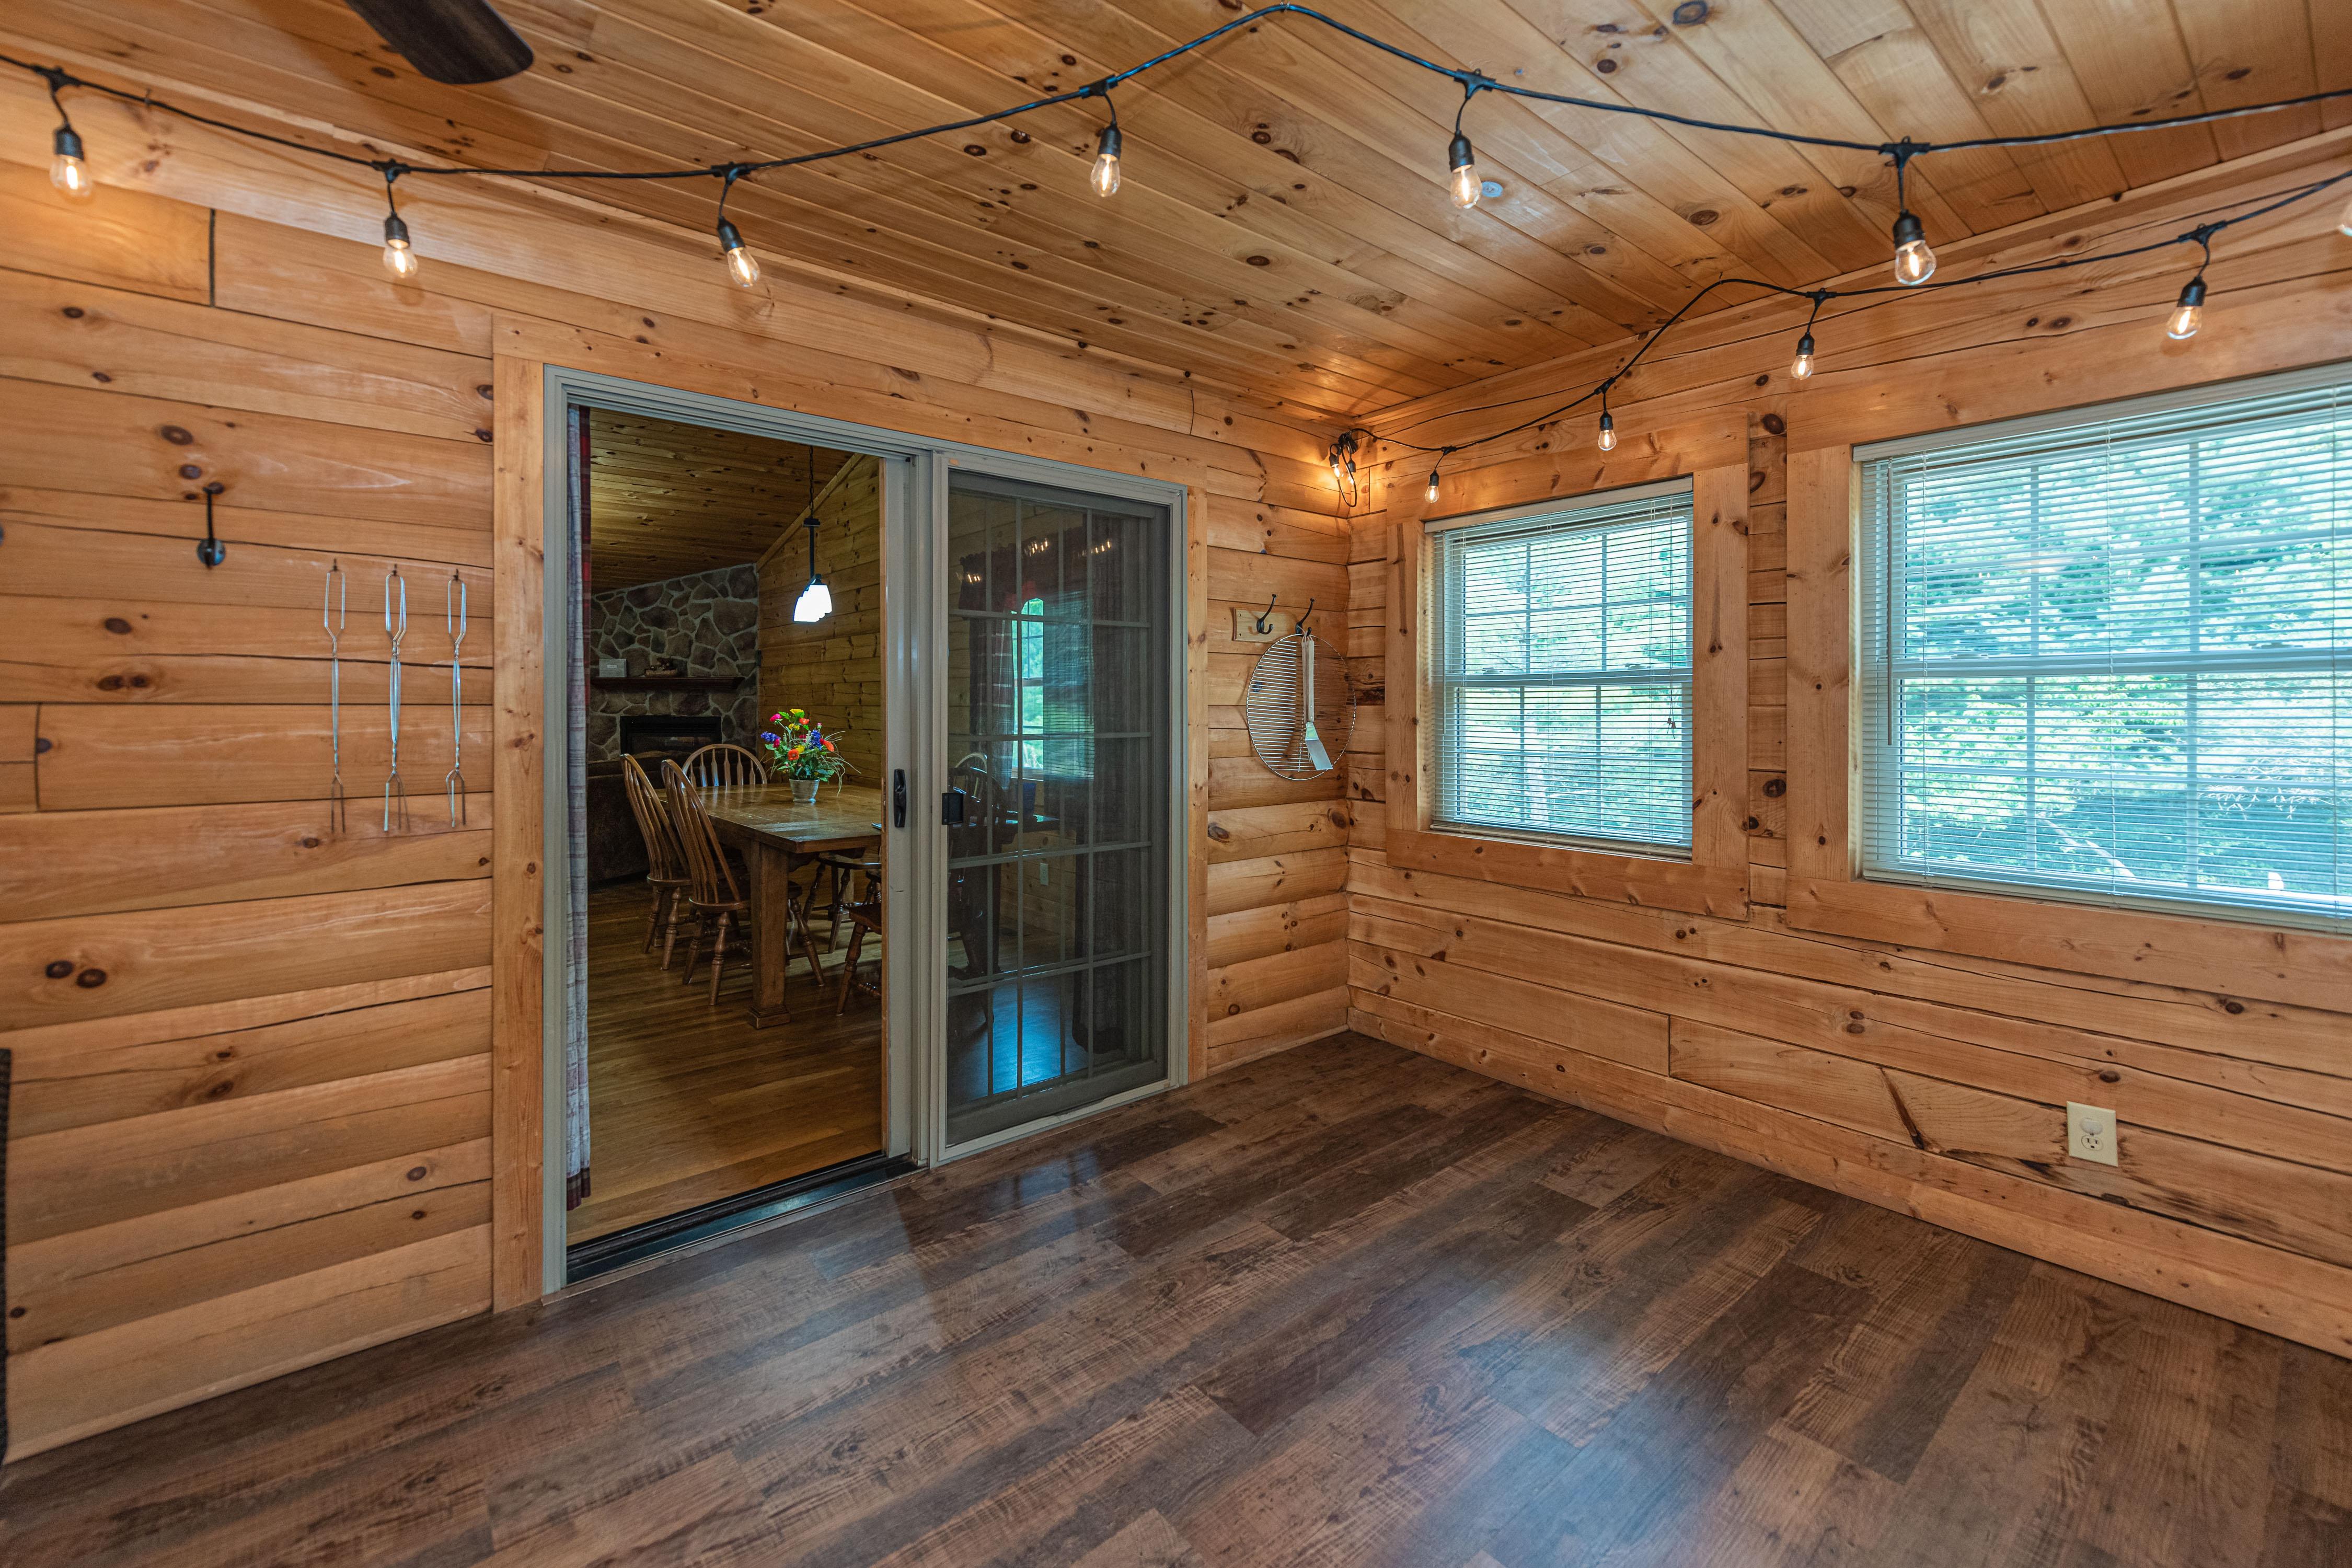 Photo 2006_11759.jpg - Sunrise Lodge 3 season room into kitchen